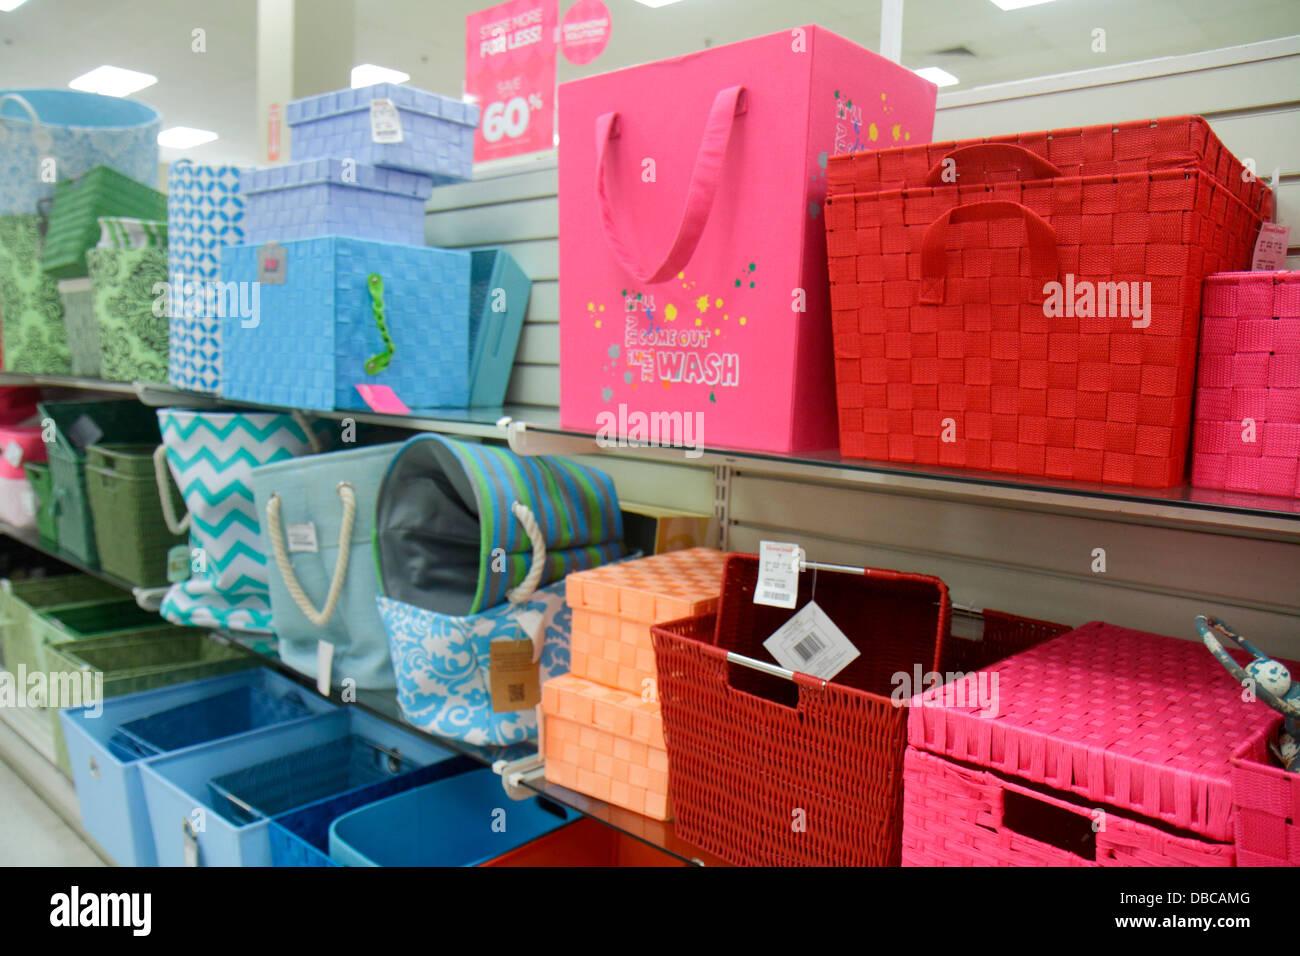 Miami Florida Aventura Marshalls Home Goods Discount Department Store  Retail Display Sale Baskets Storage